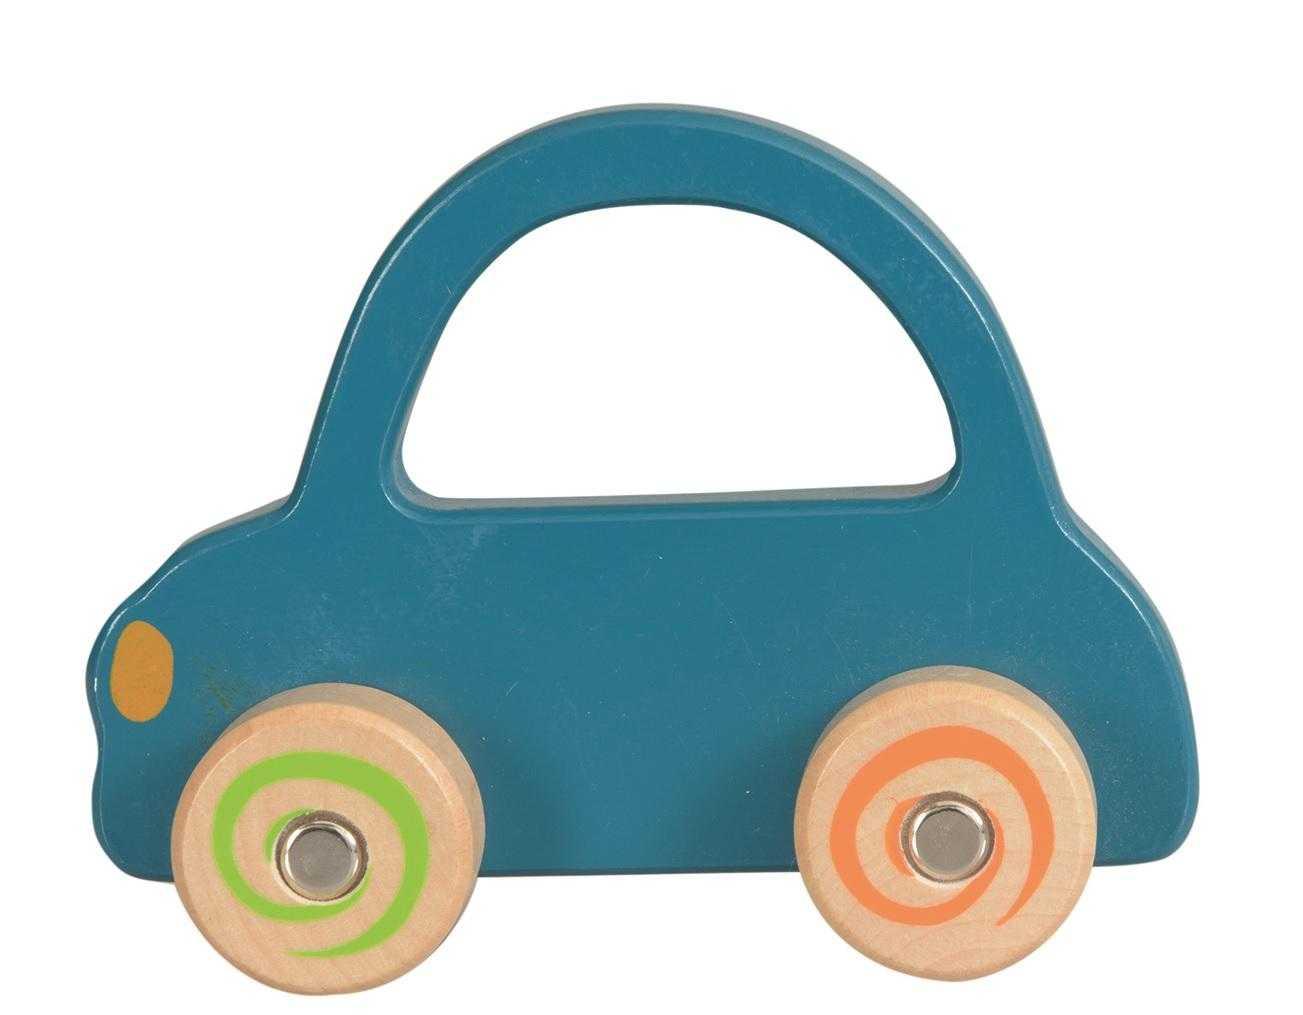 Masinuta lemn albastra egmont toys imagine